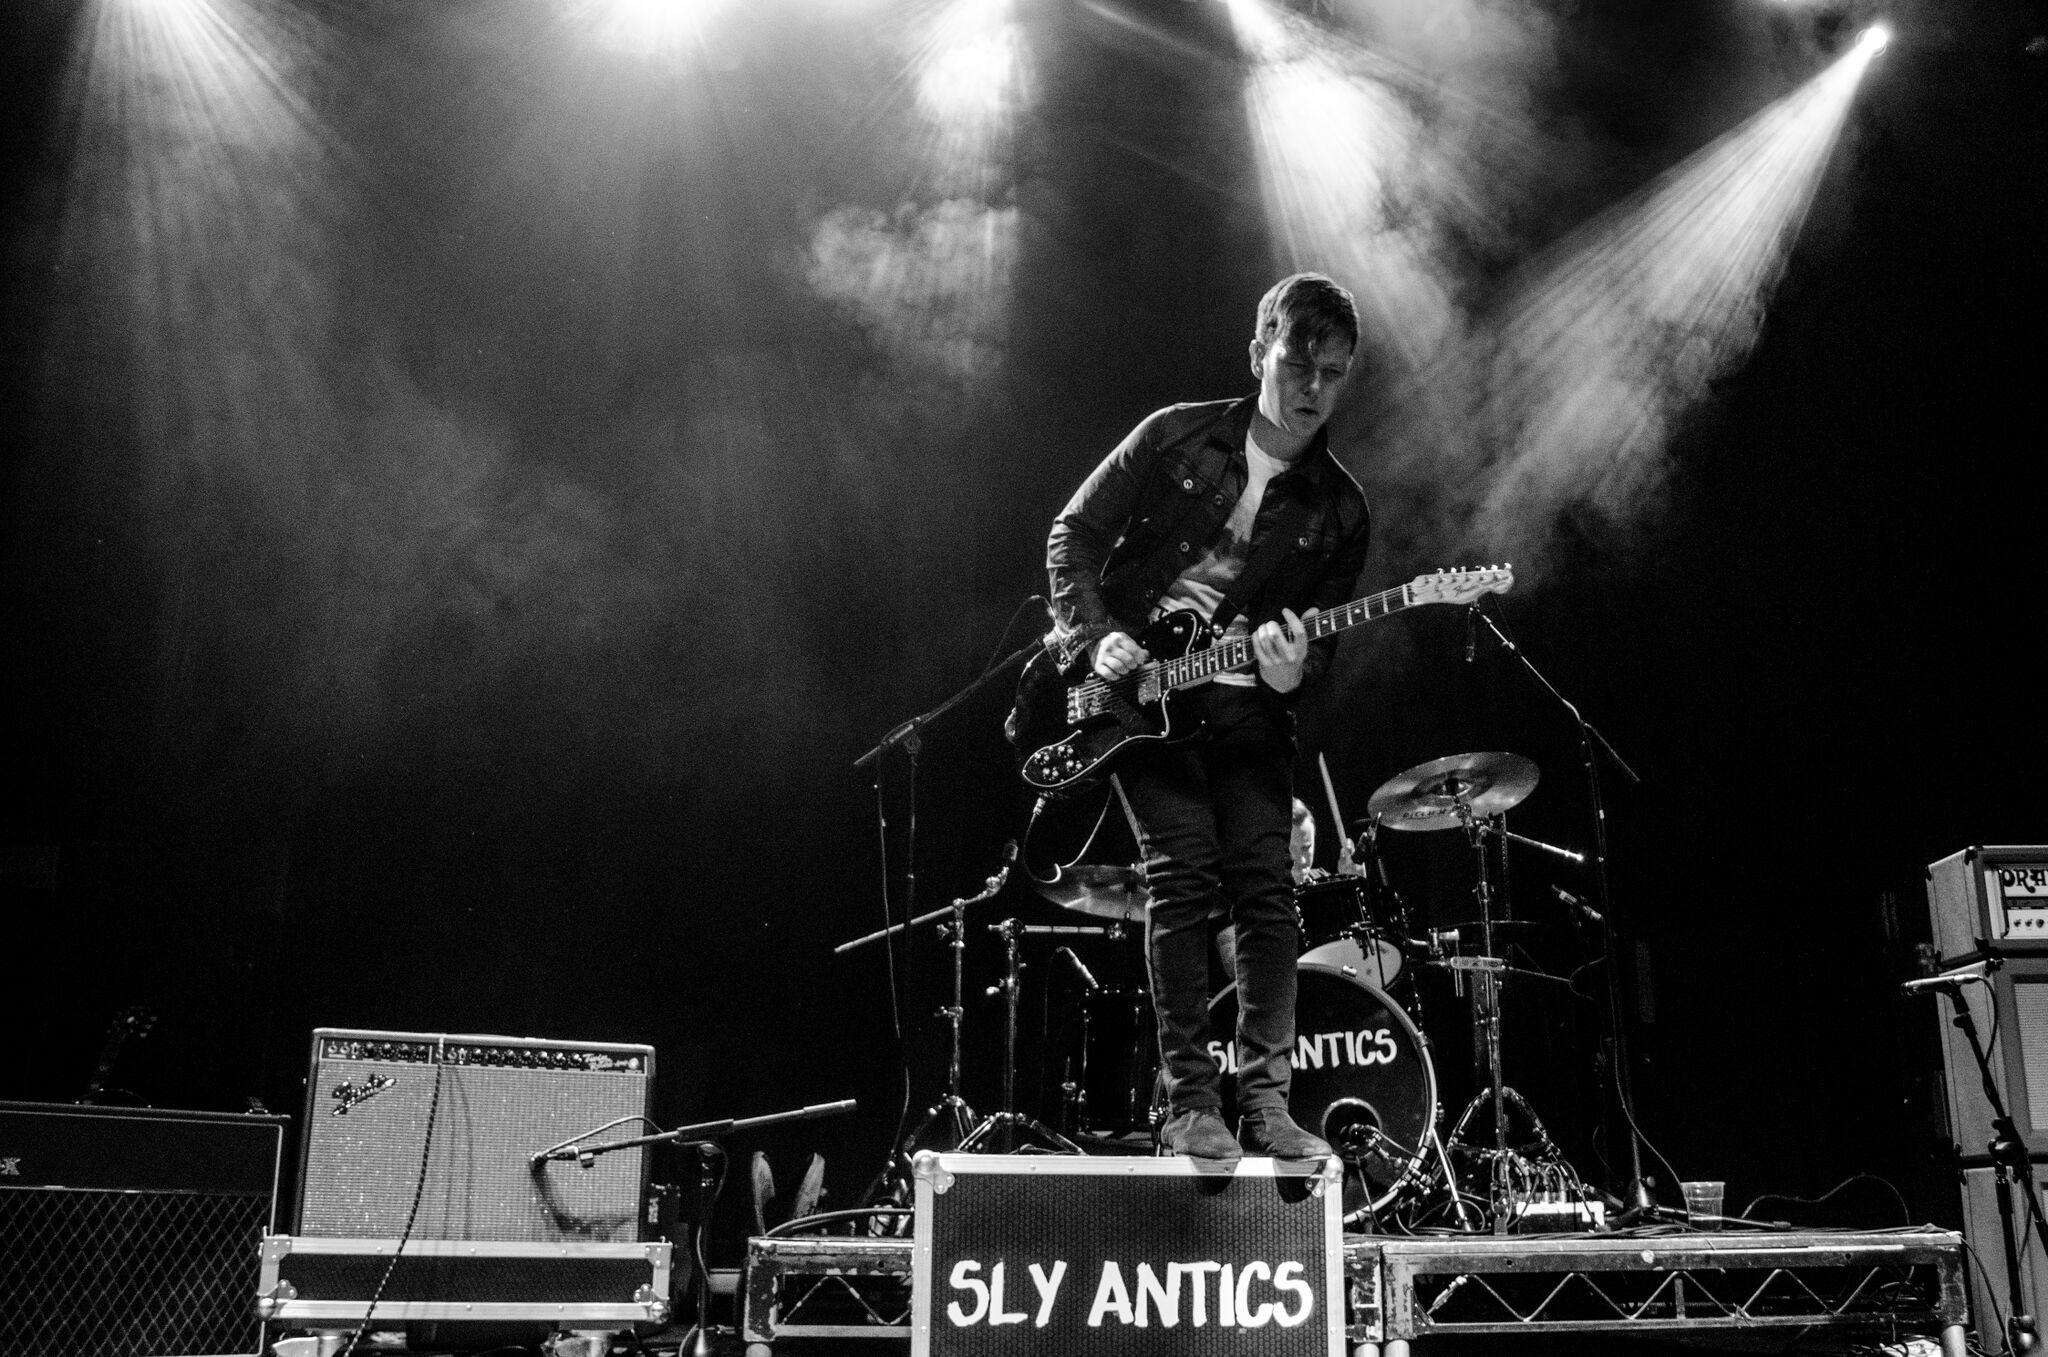 Sly Antics - O2 Ritz, Manchester